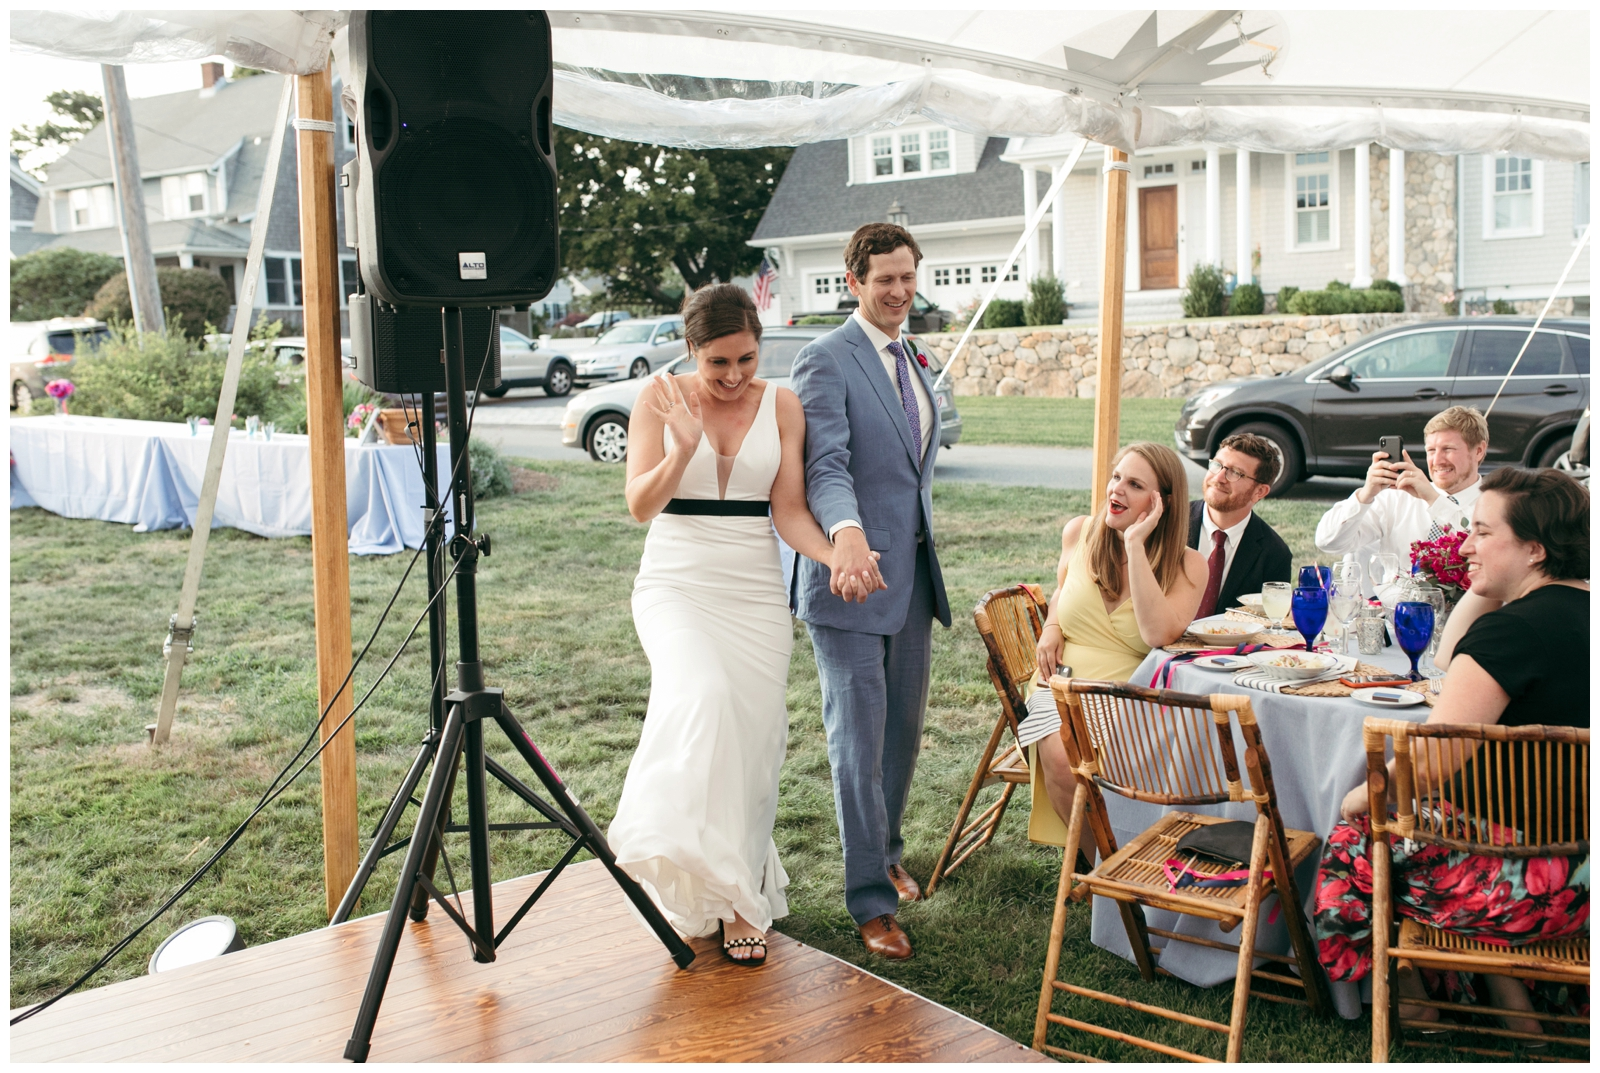 Bailey-Q-Photo-Backyard-Wedding-South-Shore-Boston-Wedding-Photographer-091.jpg